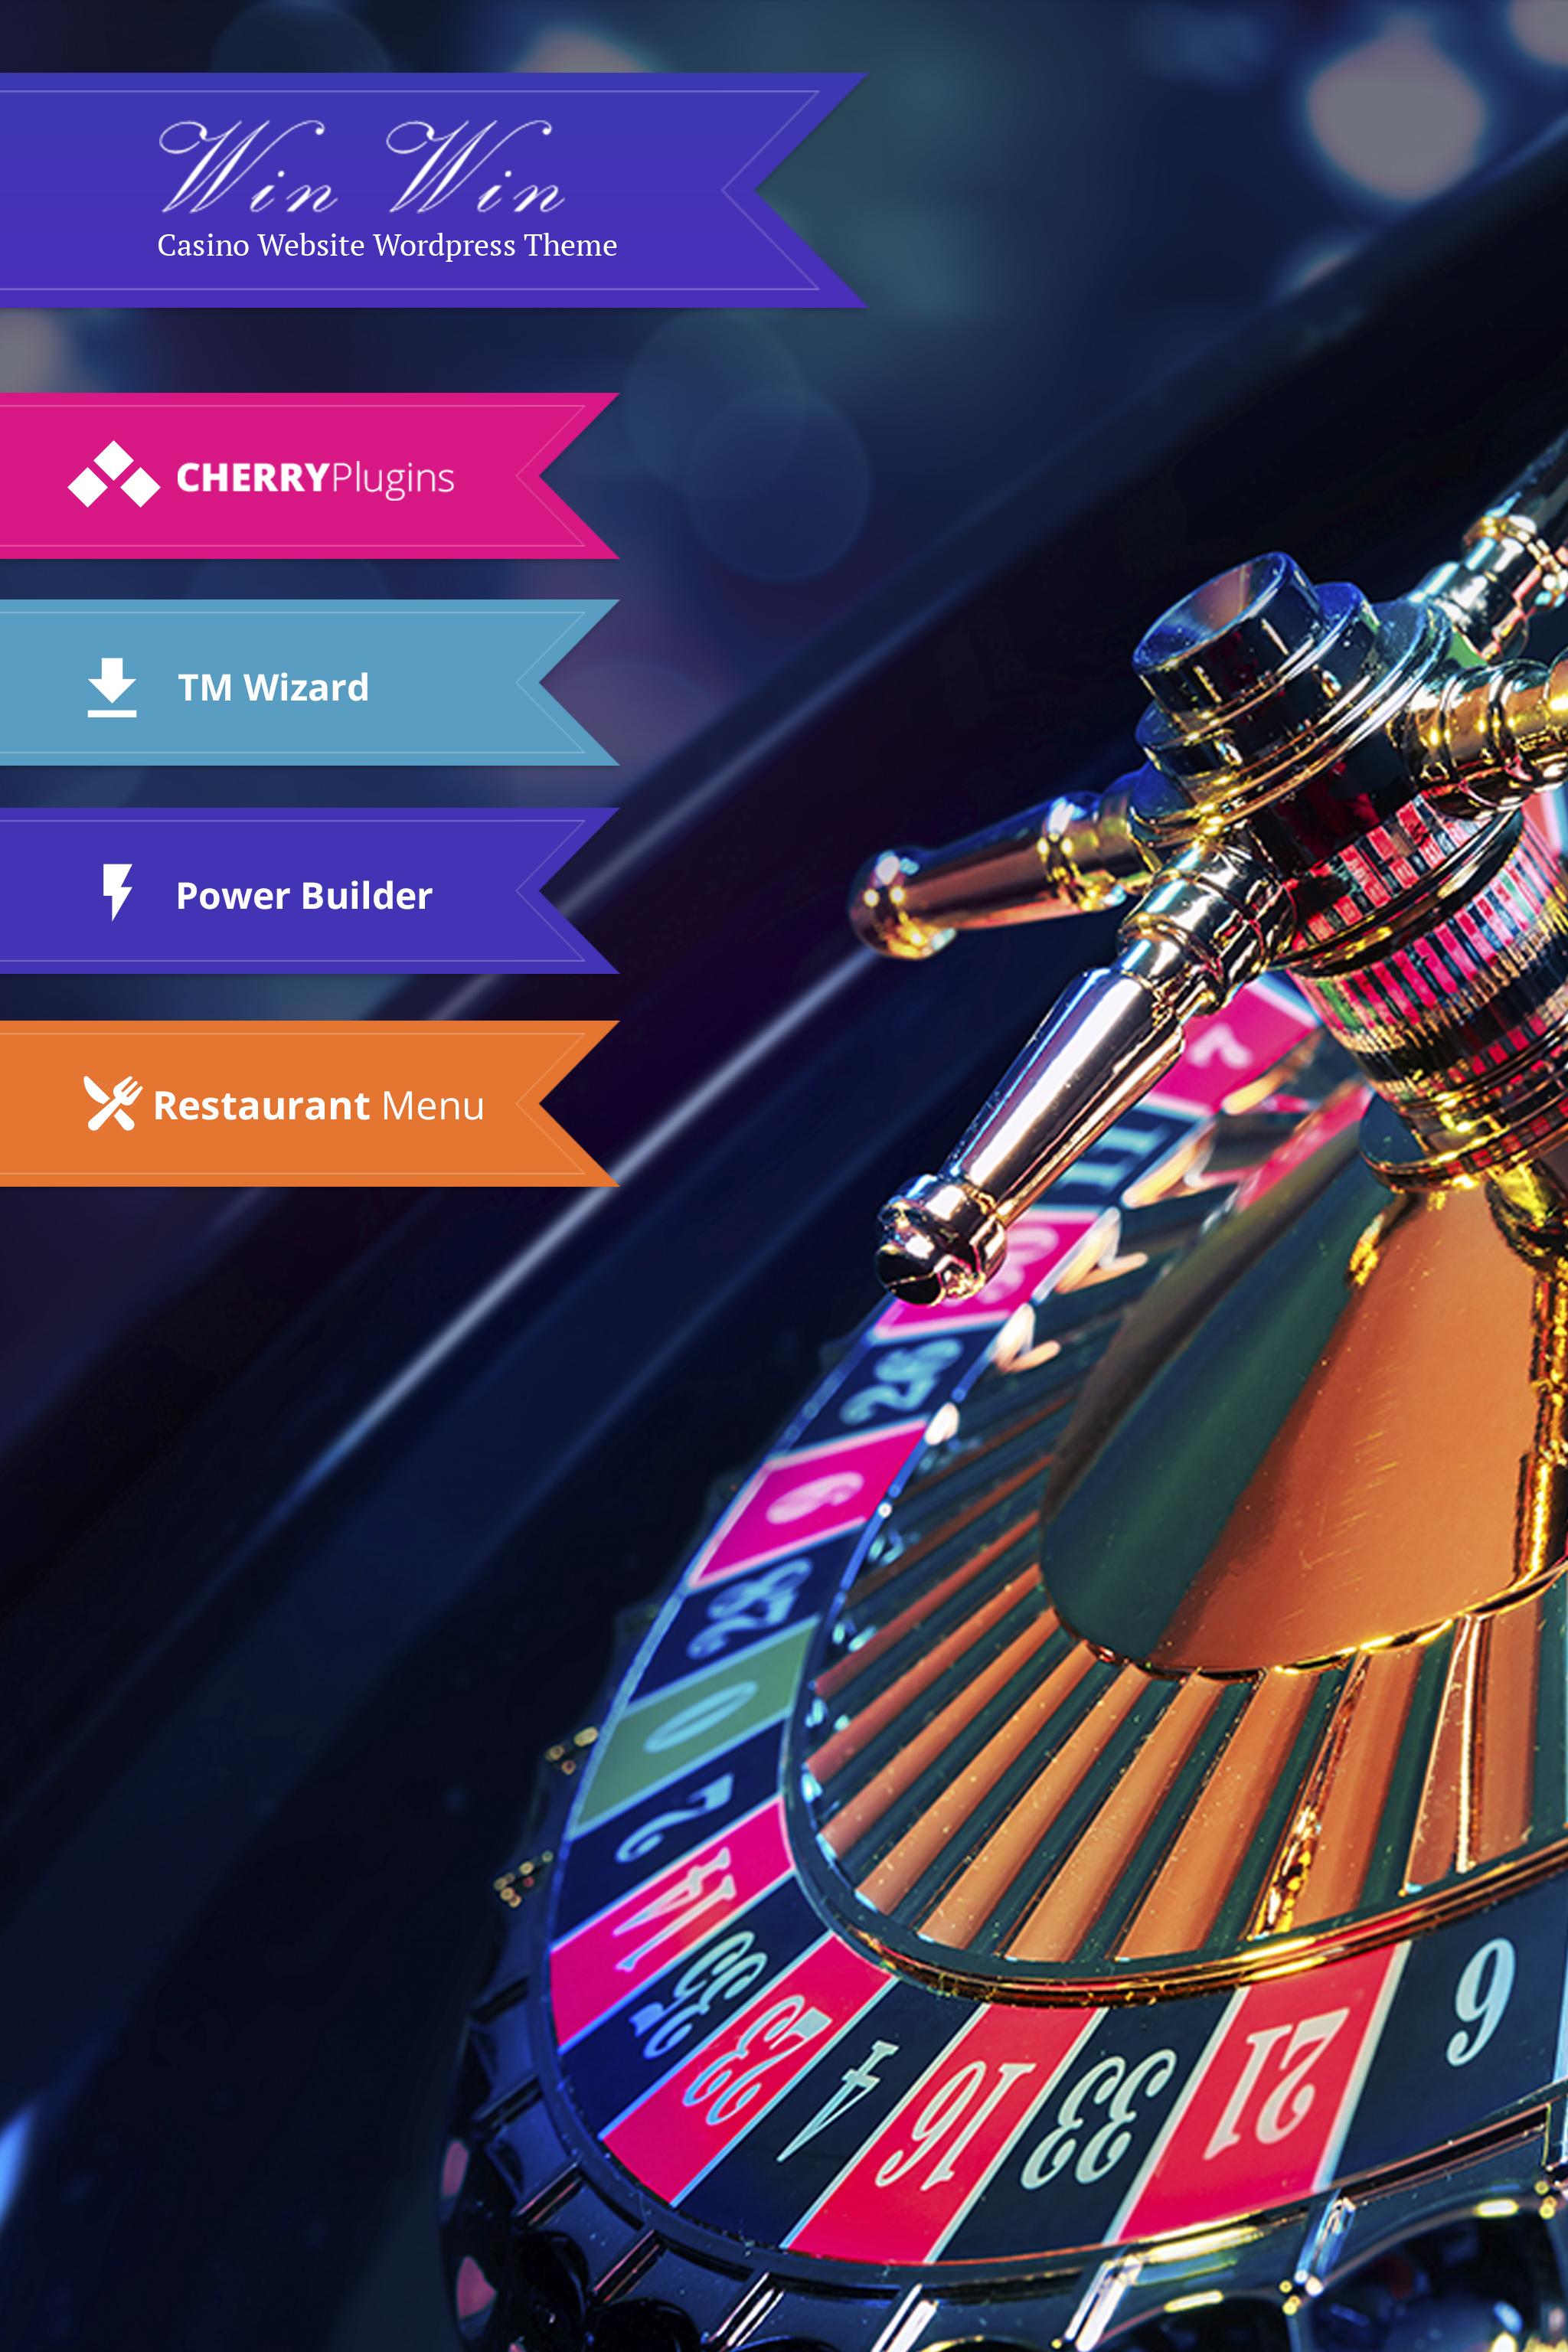 Responsivt WinWin - Casino Website WordPress Theme WordPress-tema #64702 - skärmbild